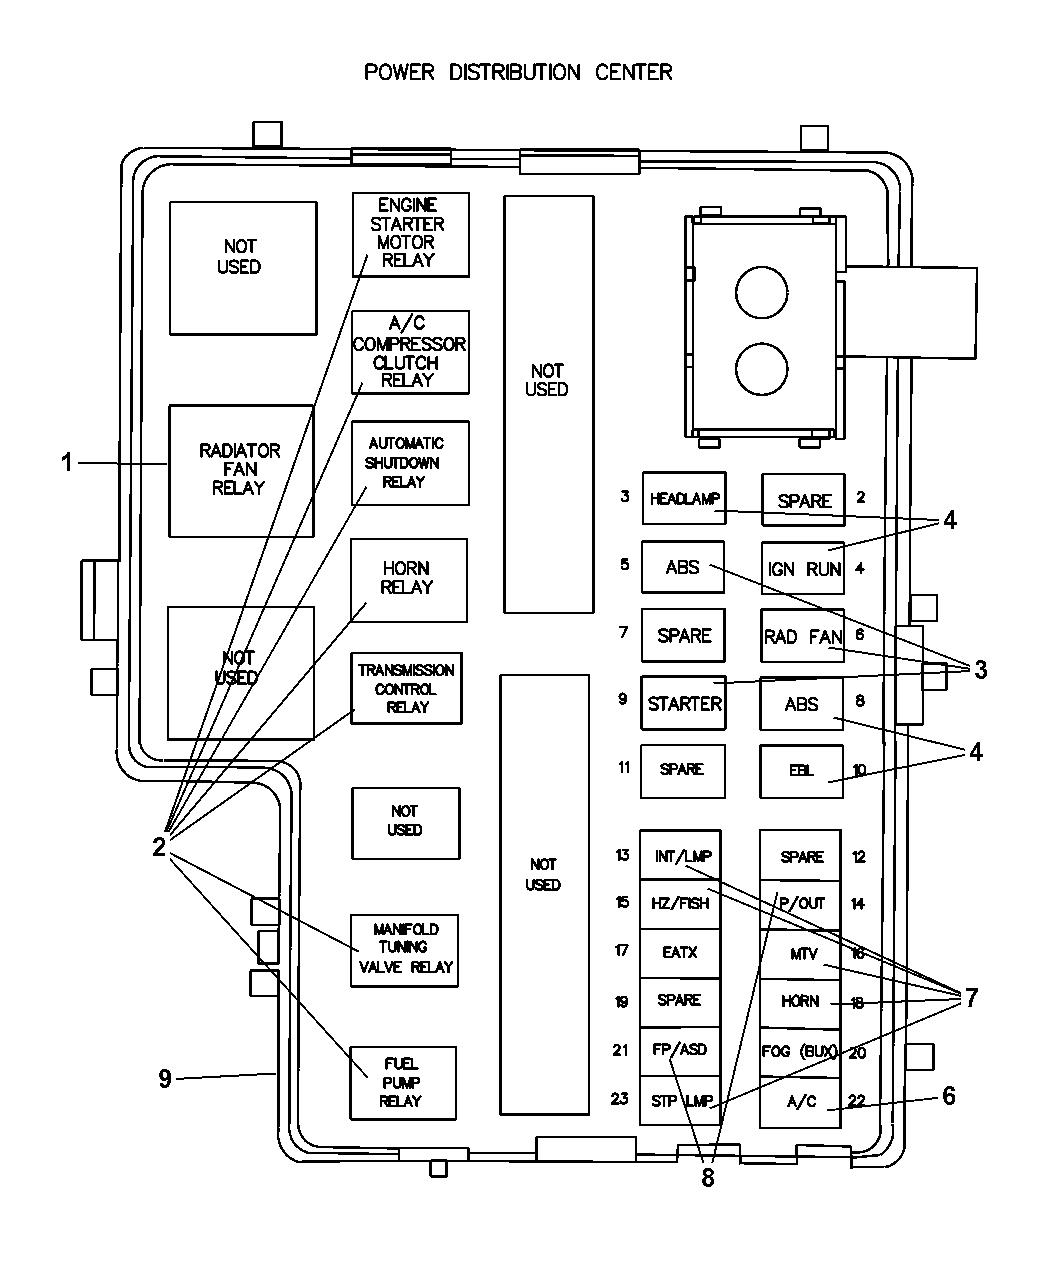 4794076AB - Genuine Dodge COVER-POWER DISTRIBUTION CENTERMopar Parts Giant